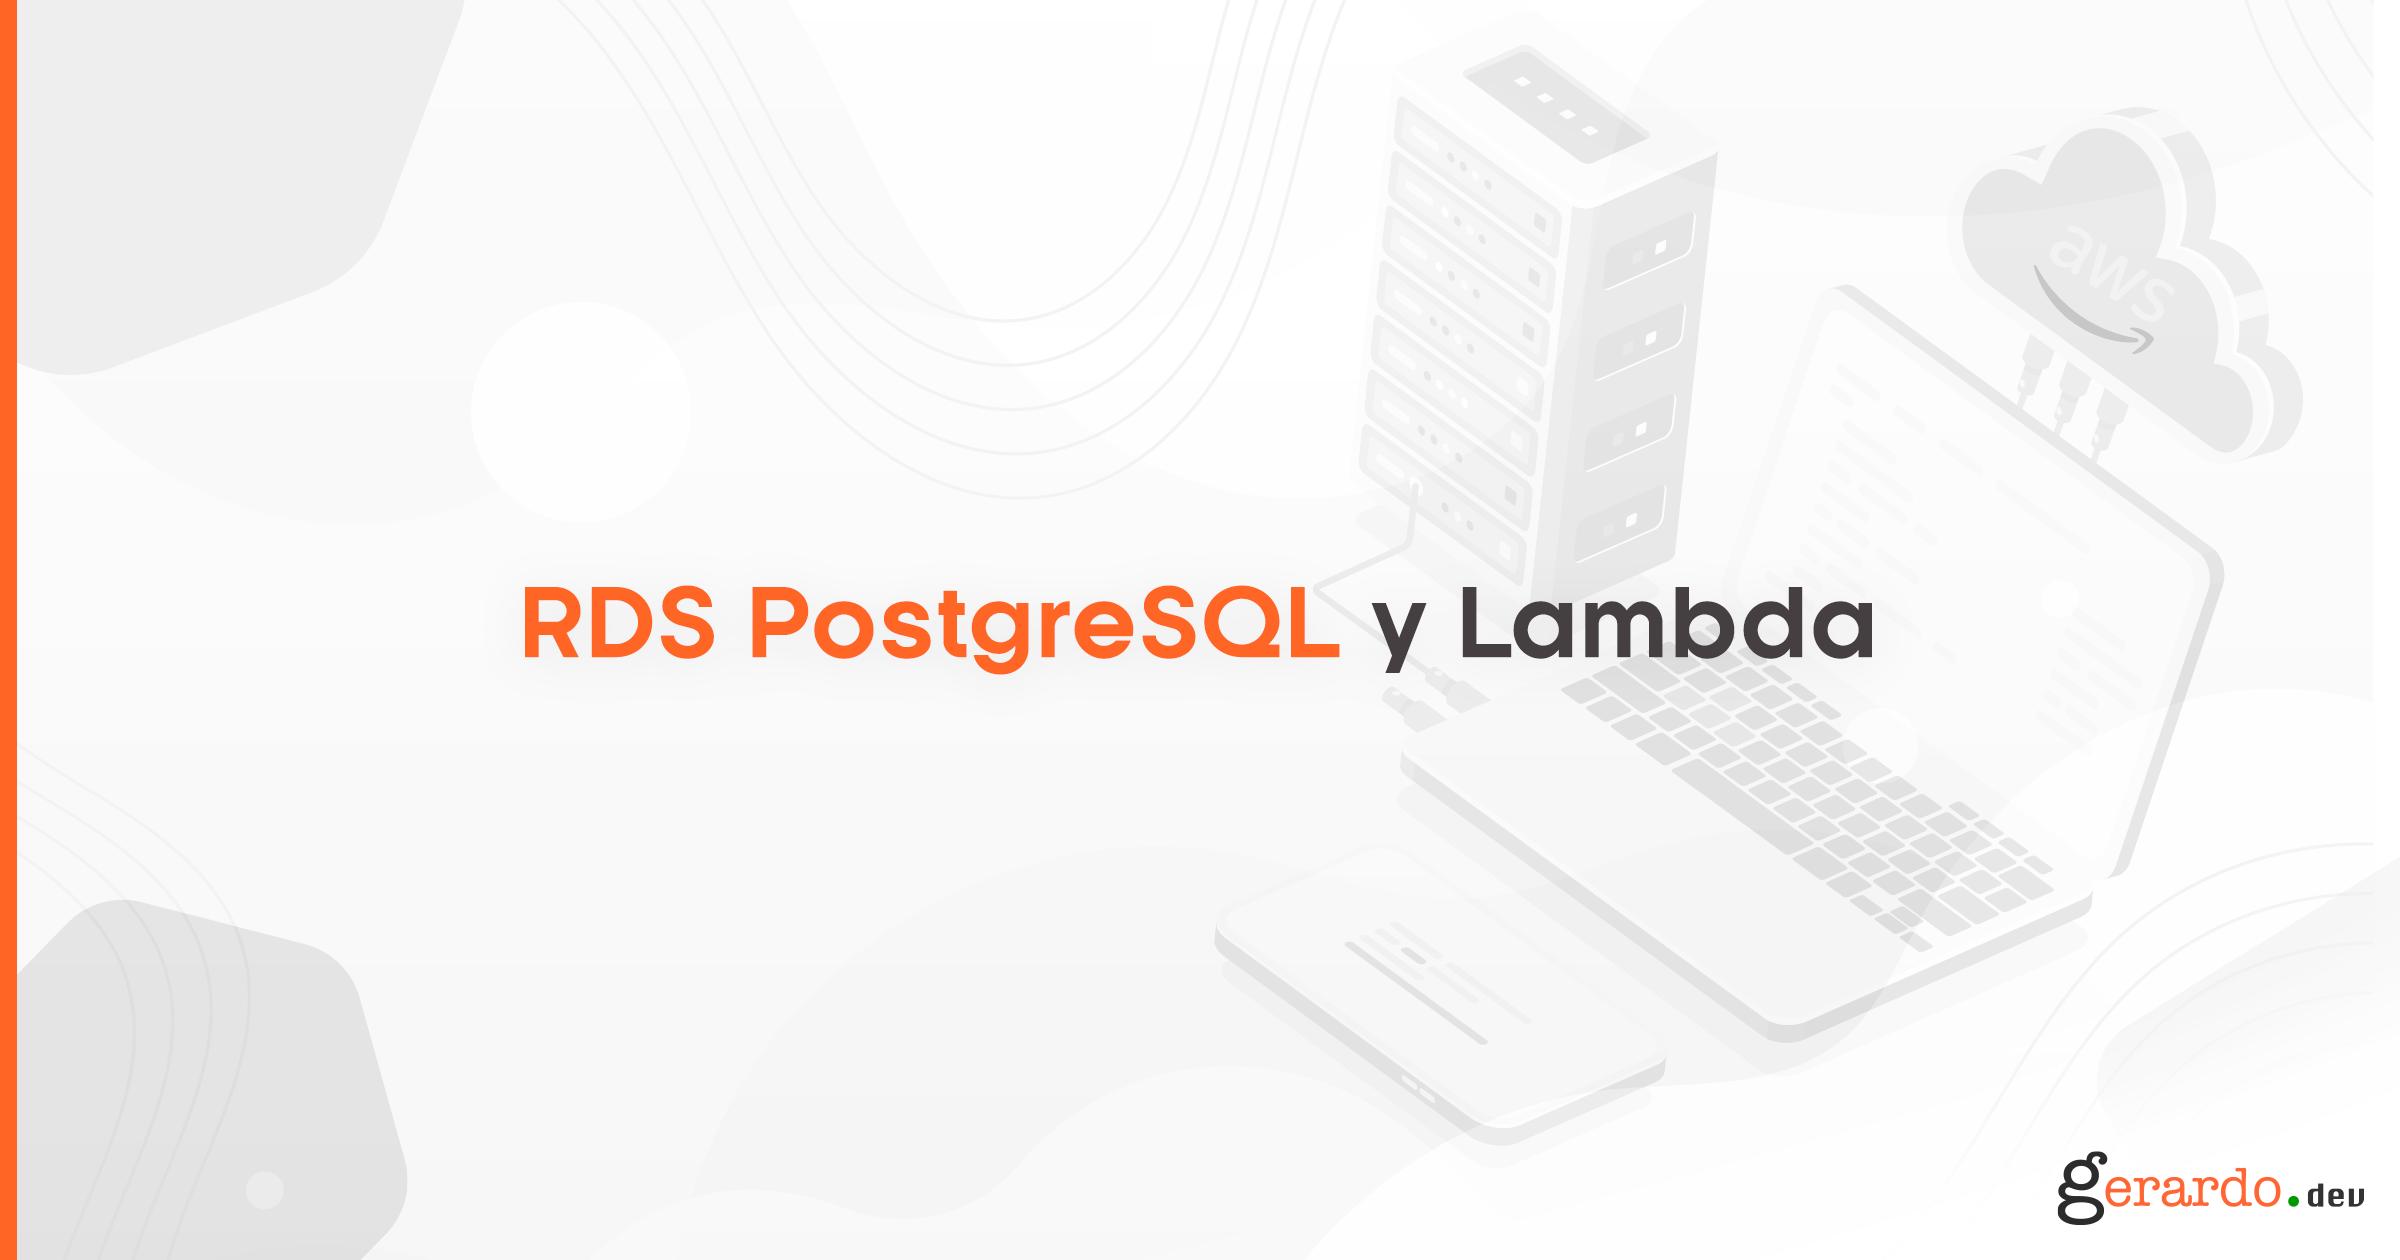 AWS RDS PostgreSQL y Lambdas